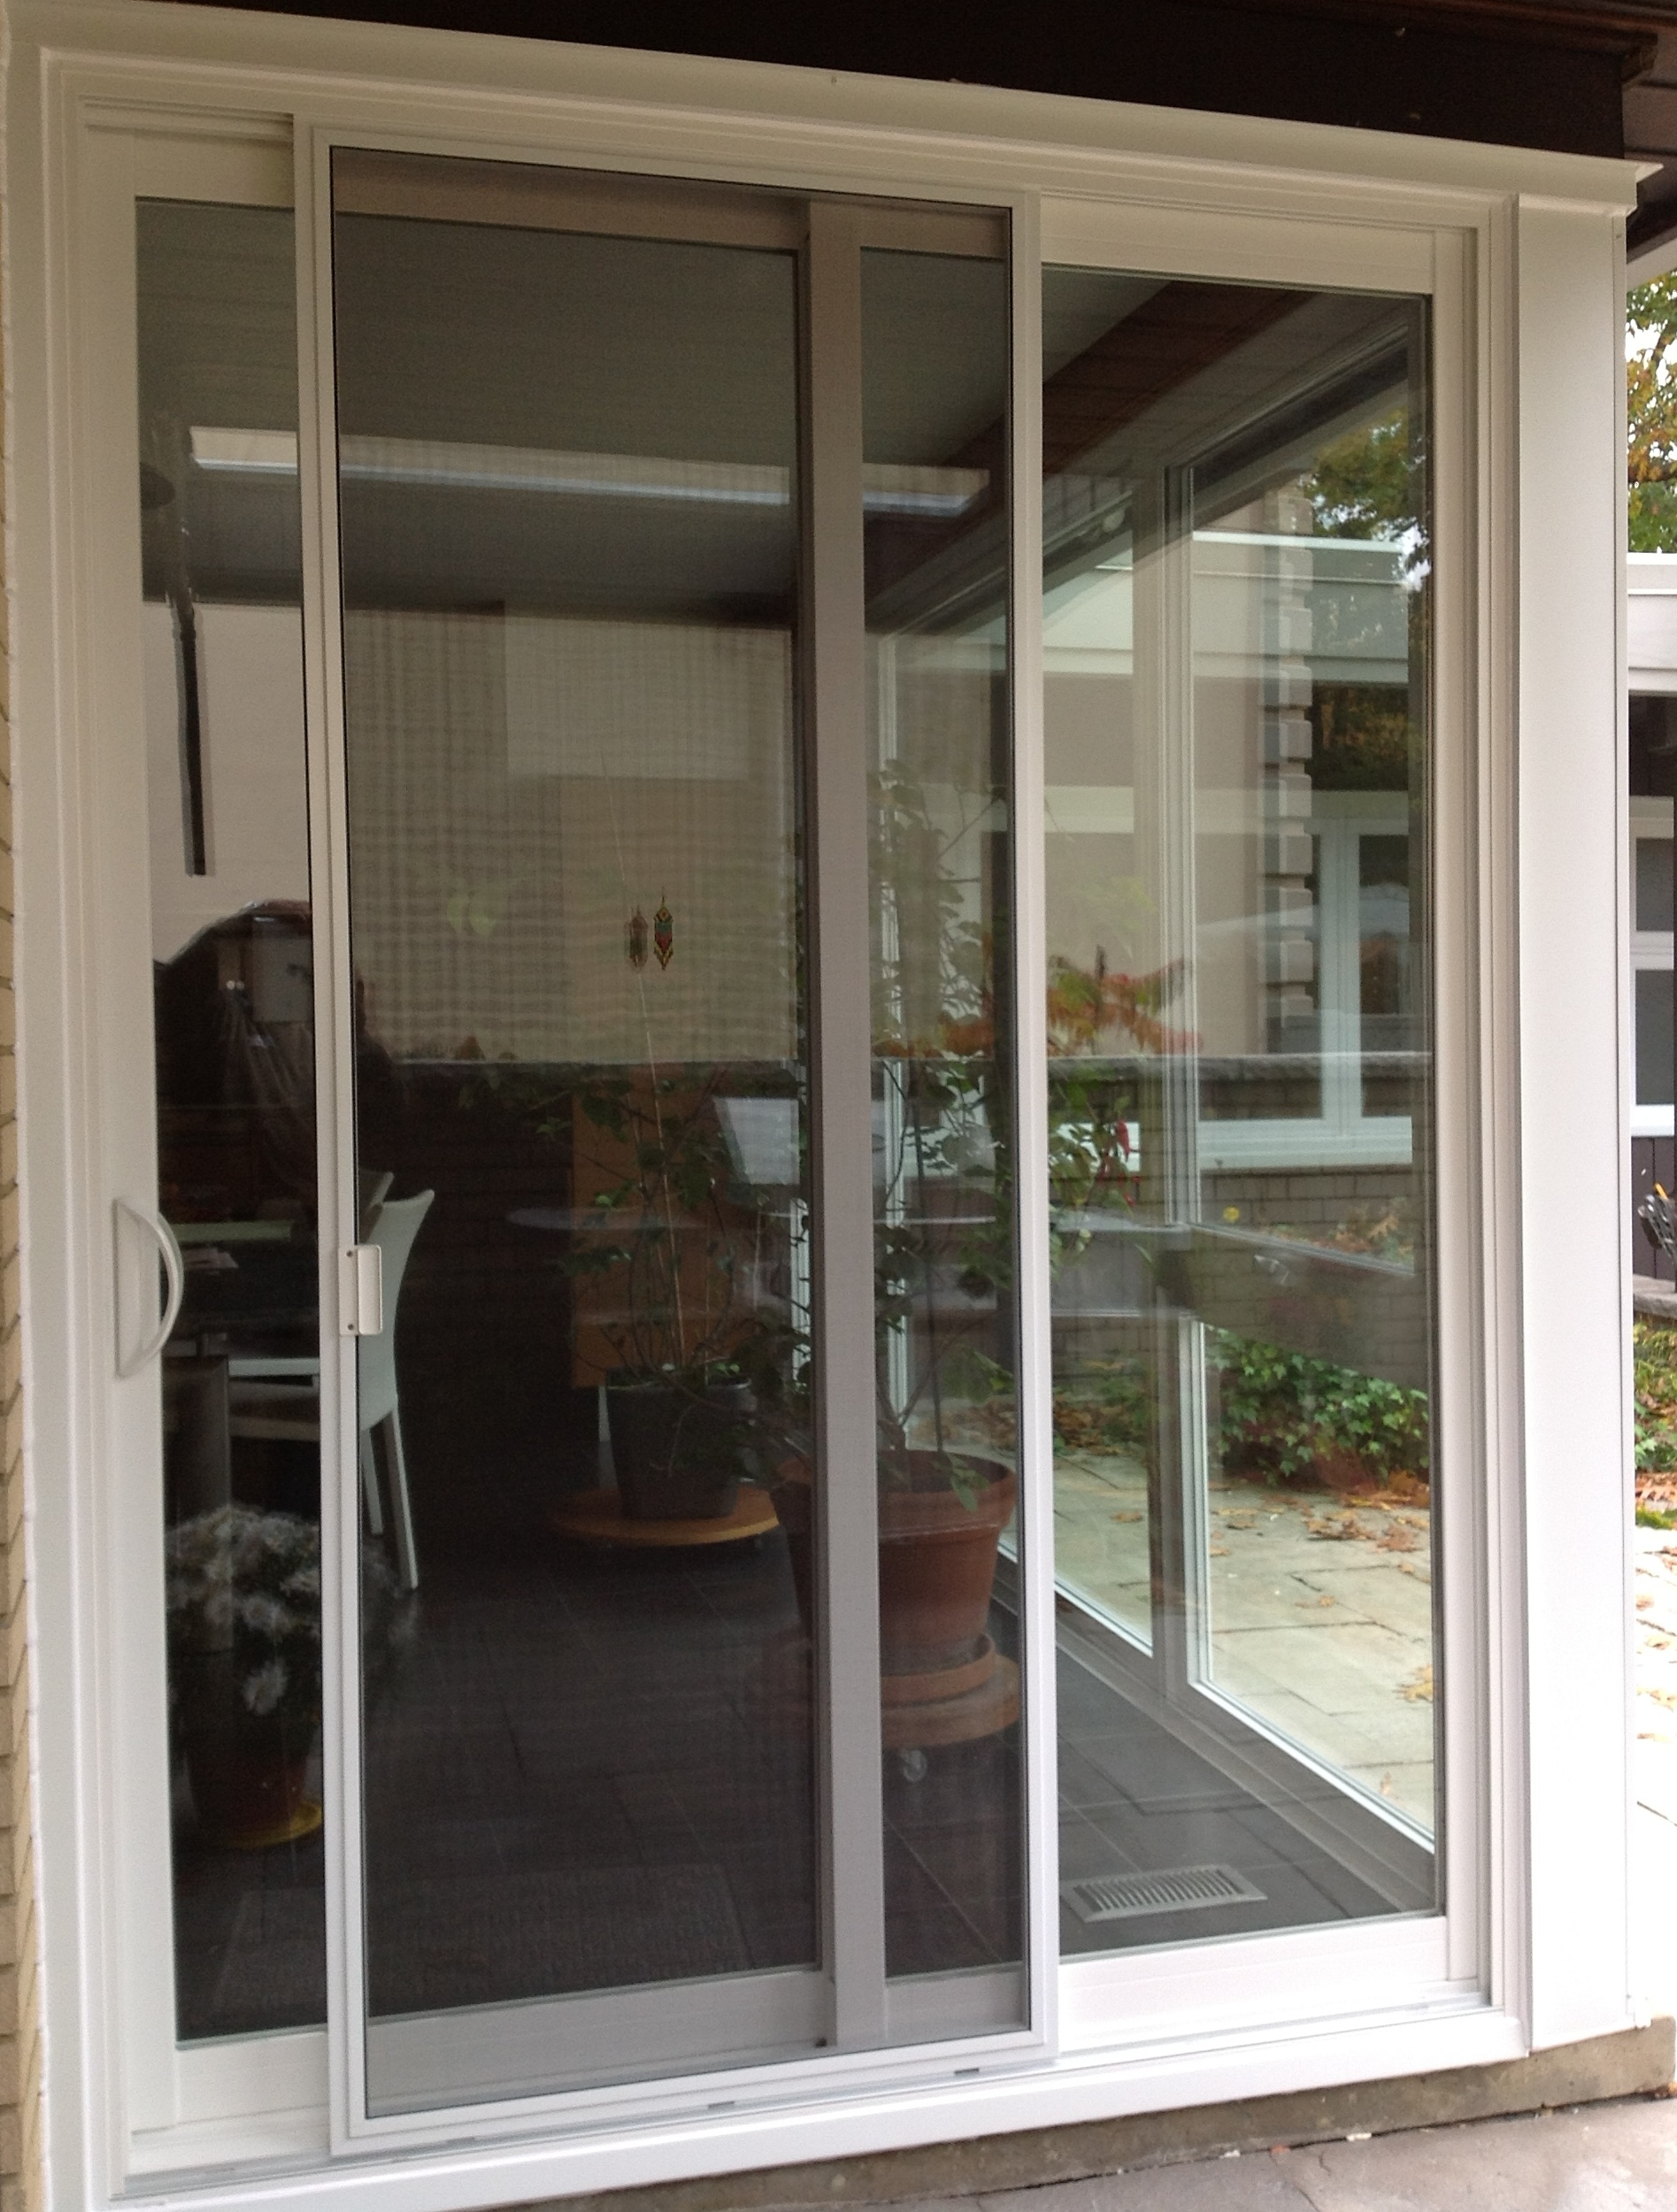 Sliding Patio Doors With Screens1895 X 2500